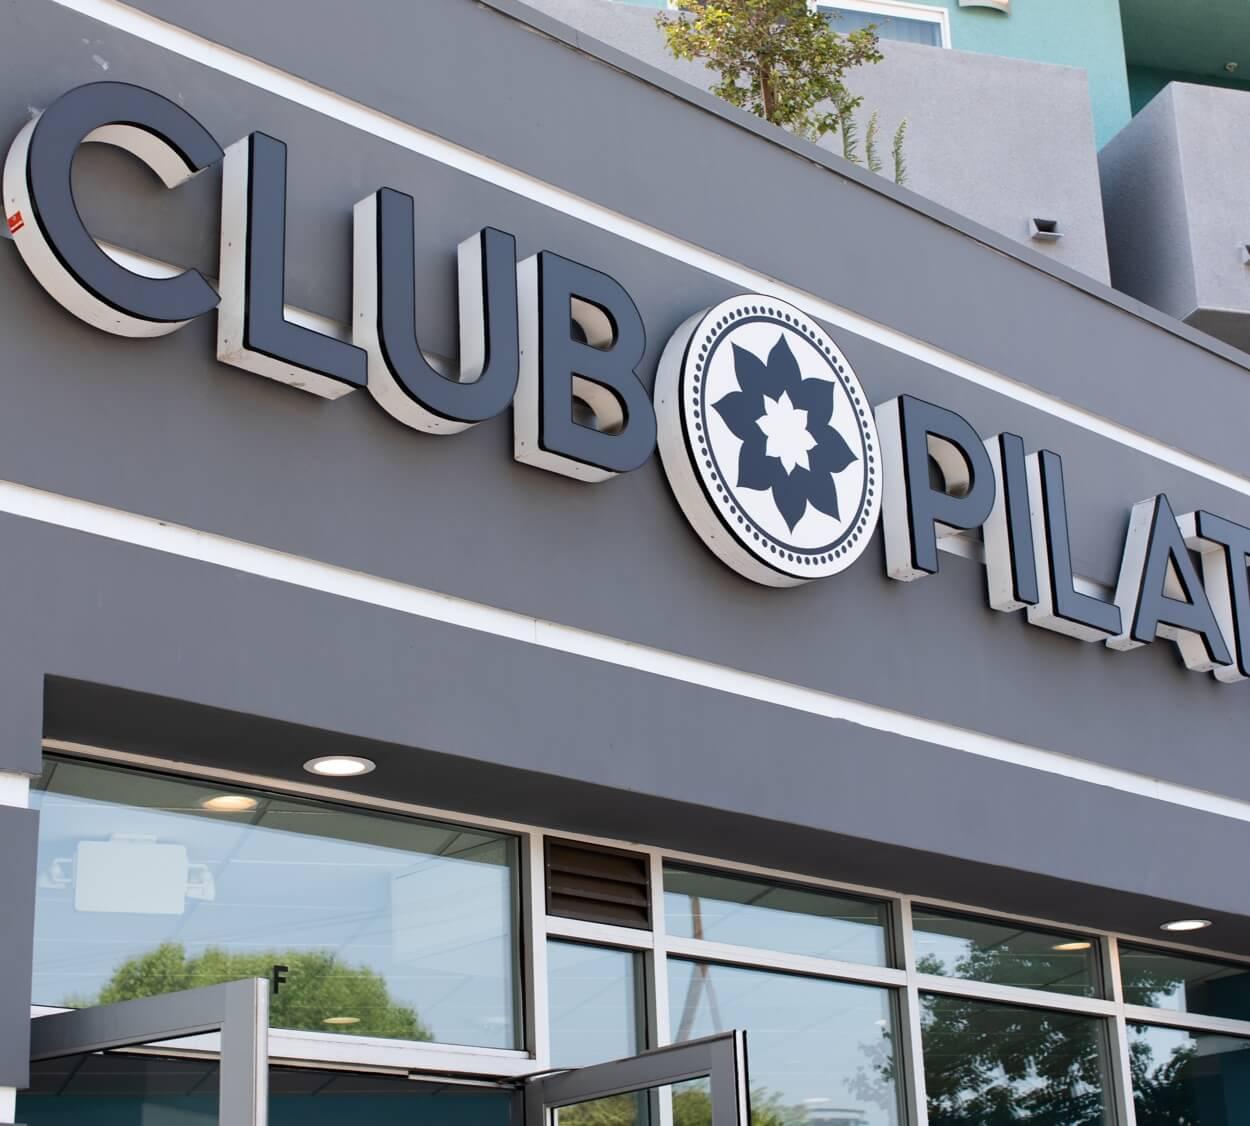 The Club Pilates Story